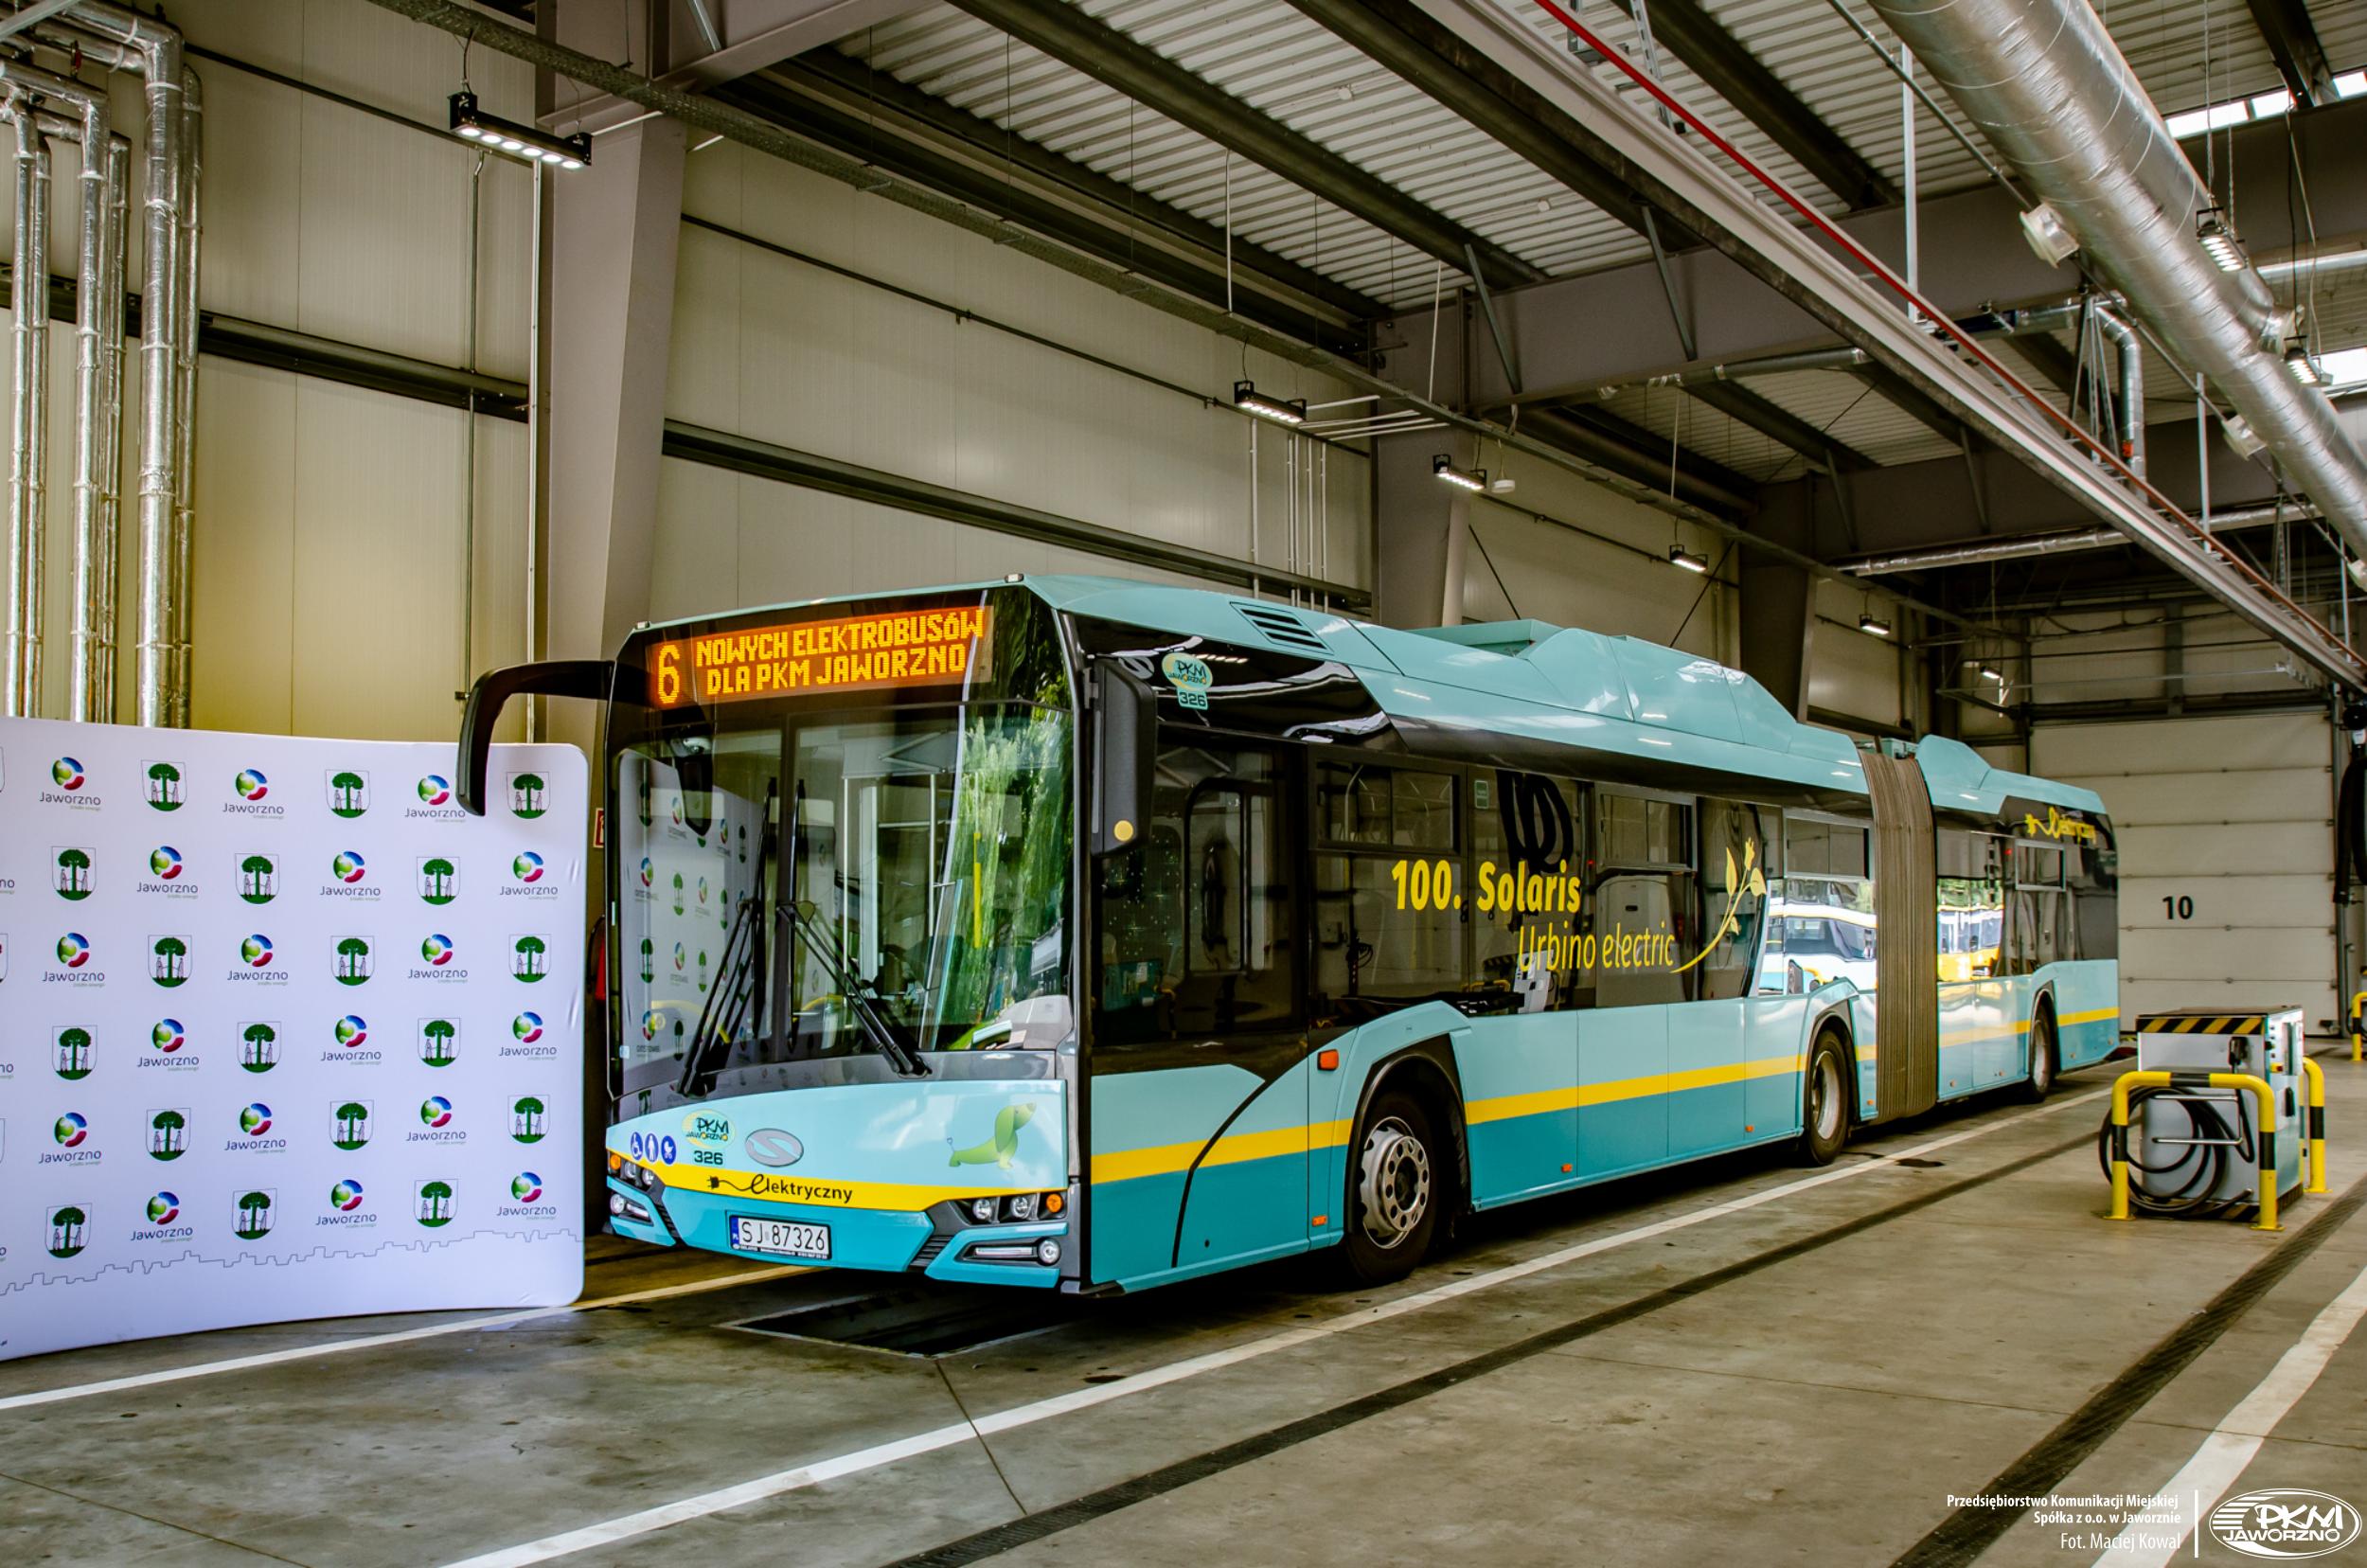 solaris buses Jaworzno